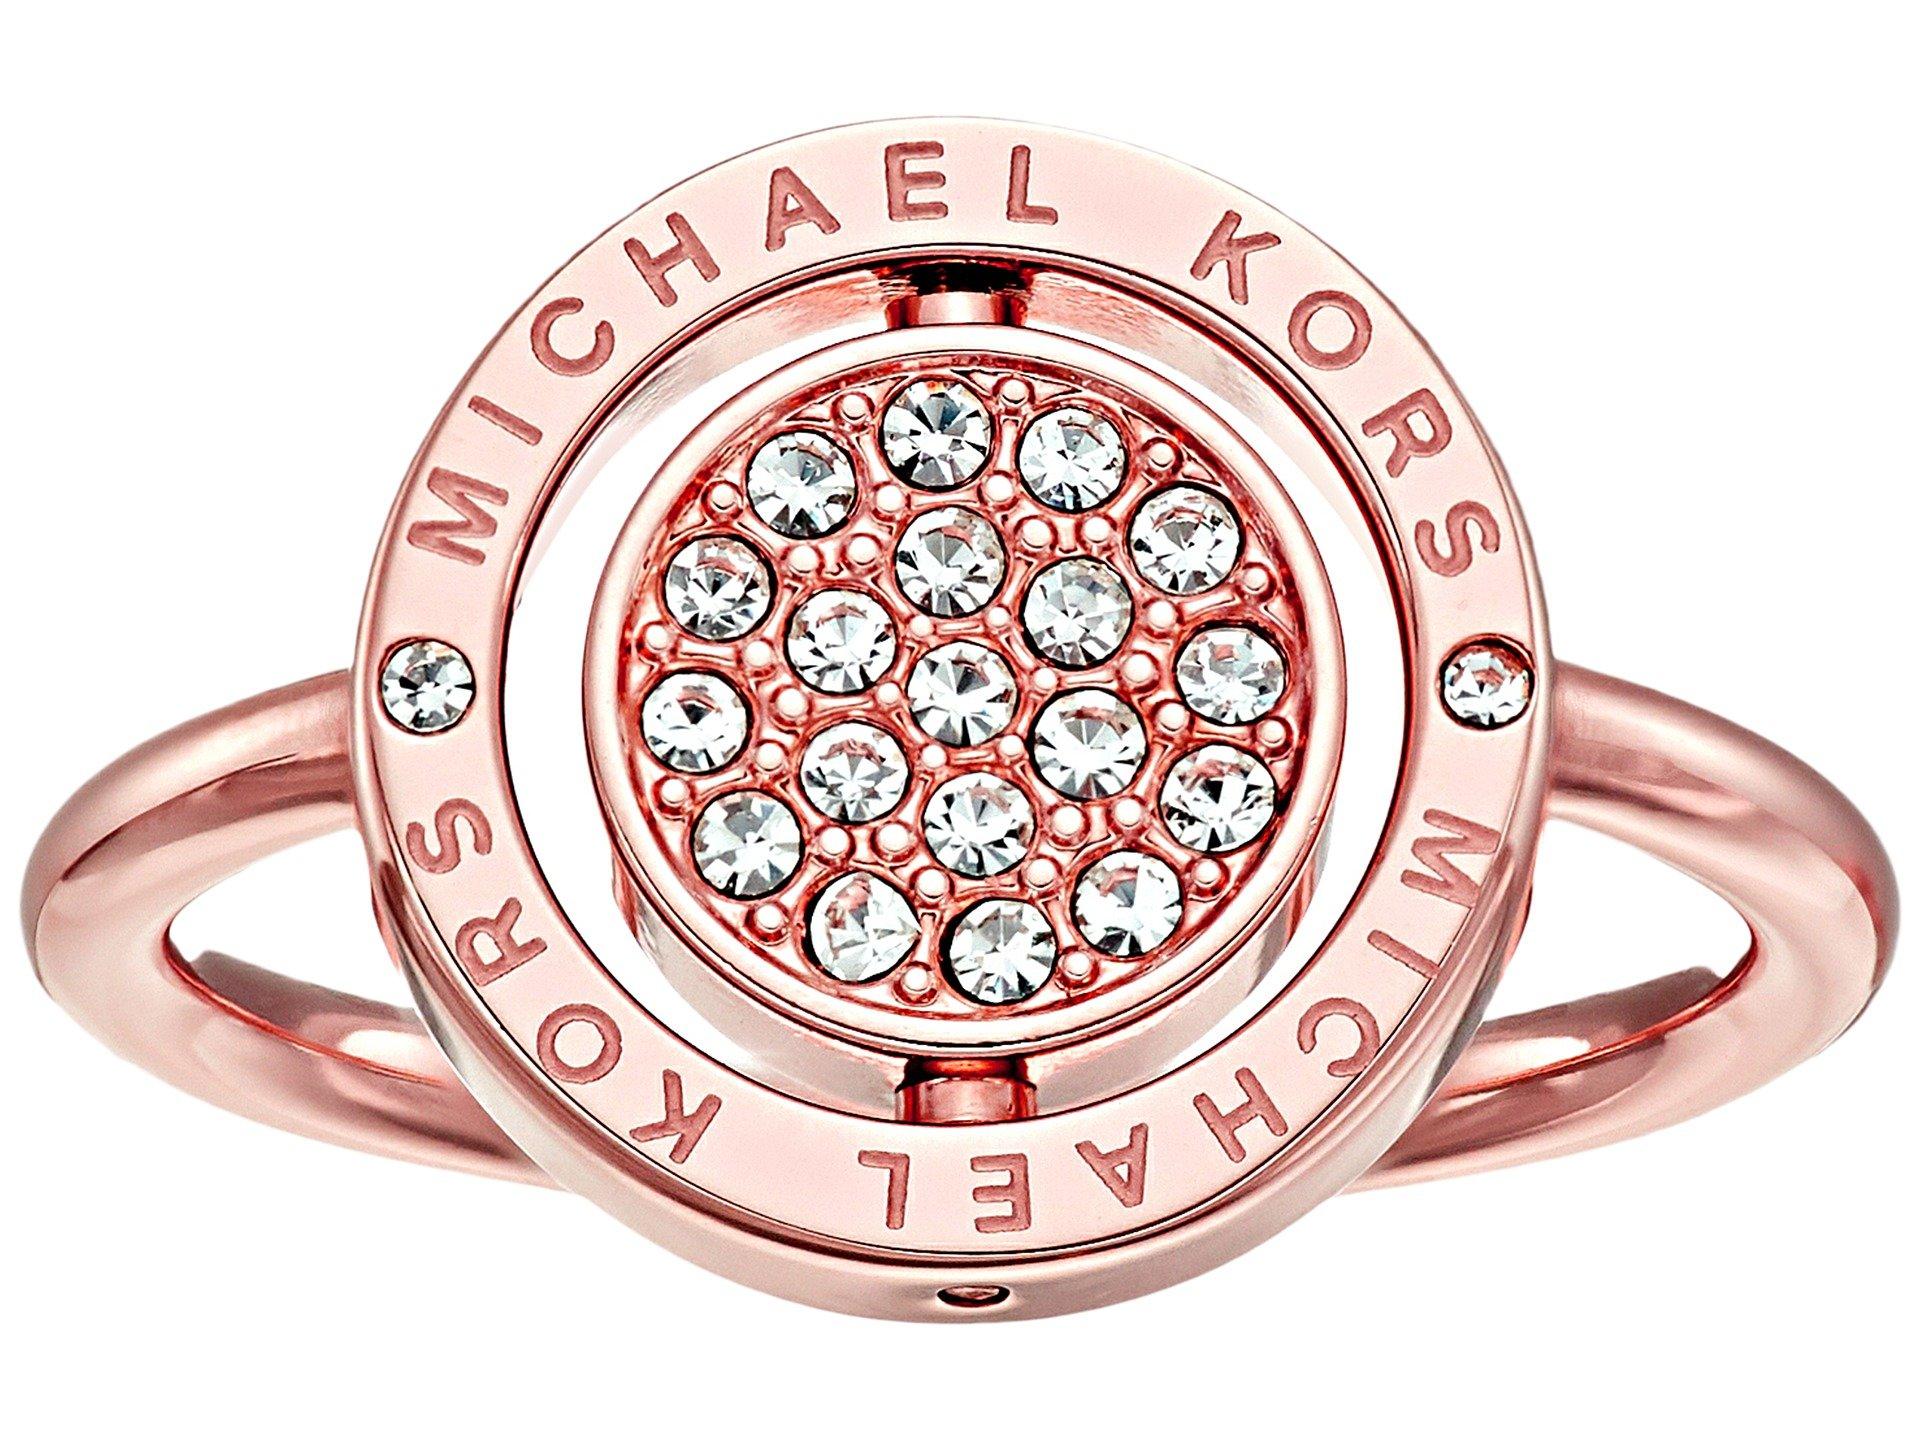 Anillo para Mujer Michael Kors Flip Glitz Ring  + Michael Kors en VeoyCompro.net